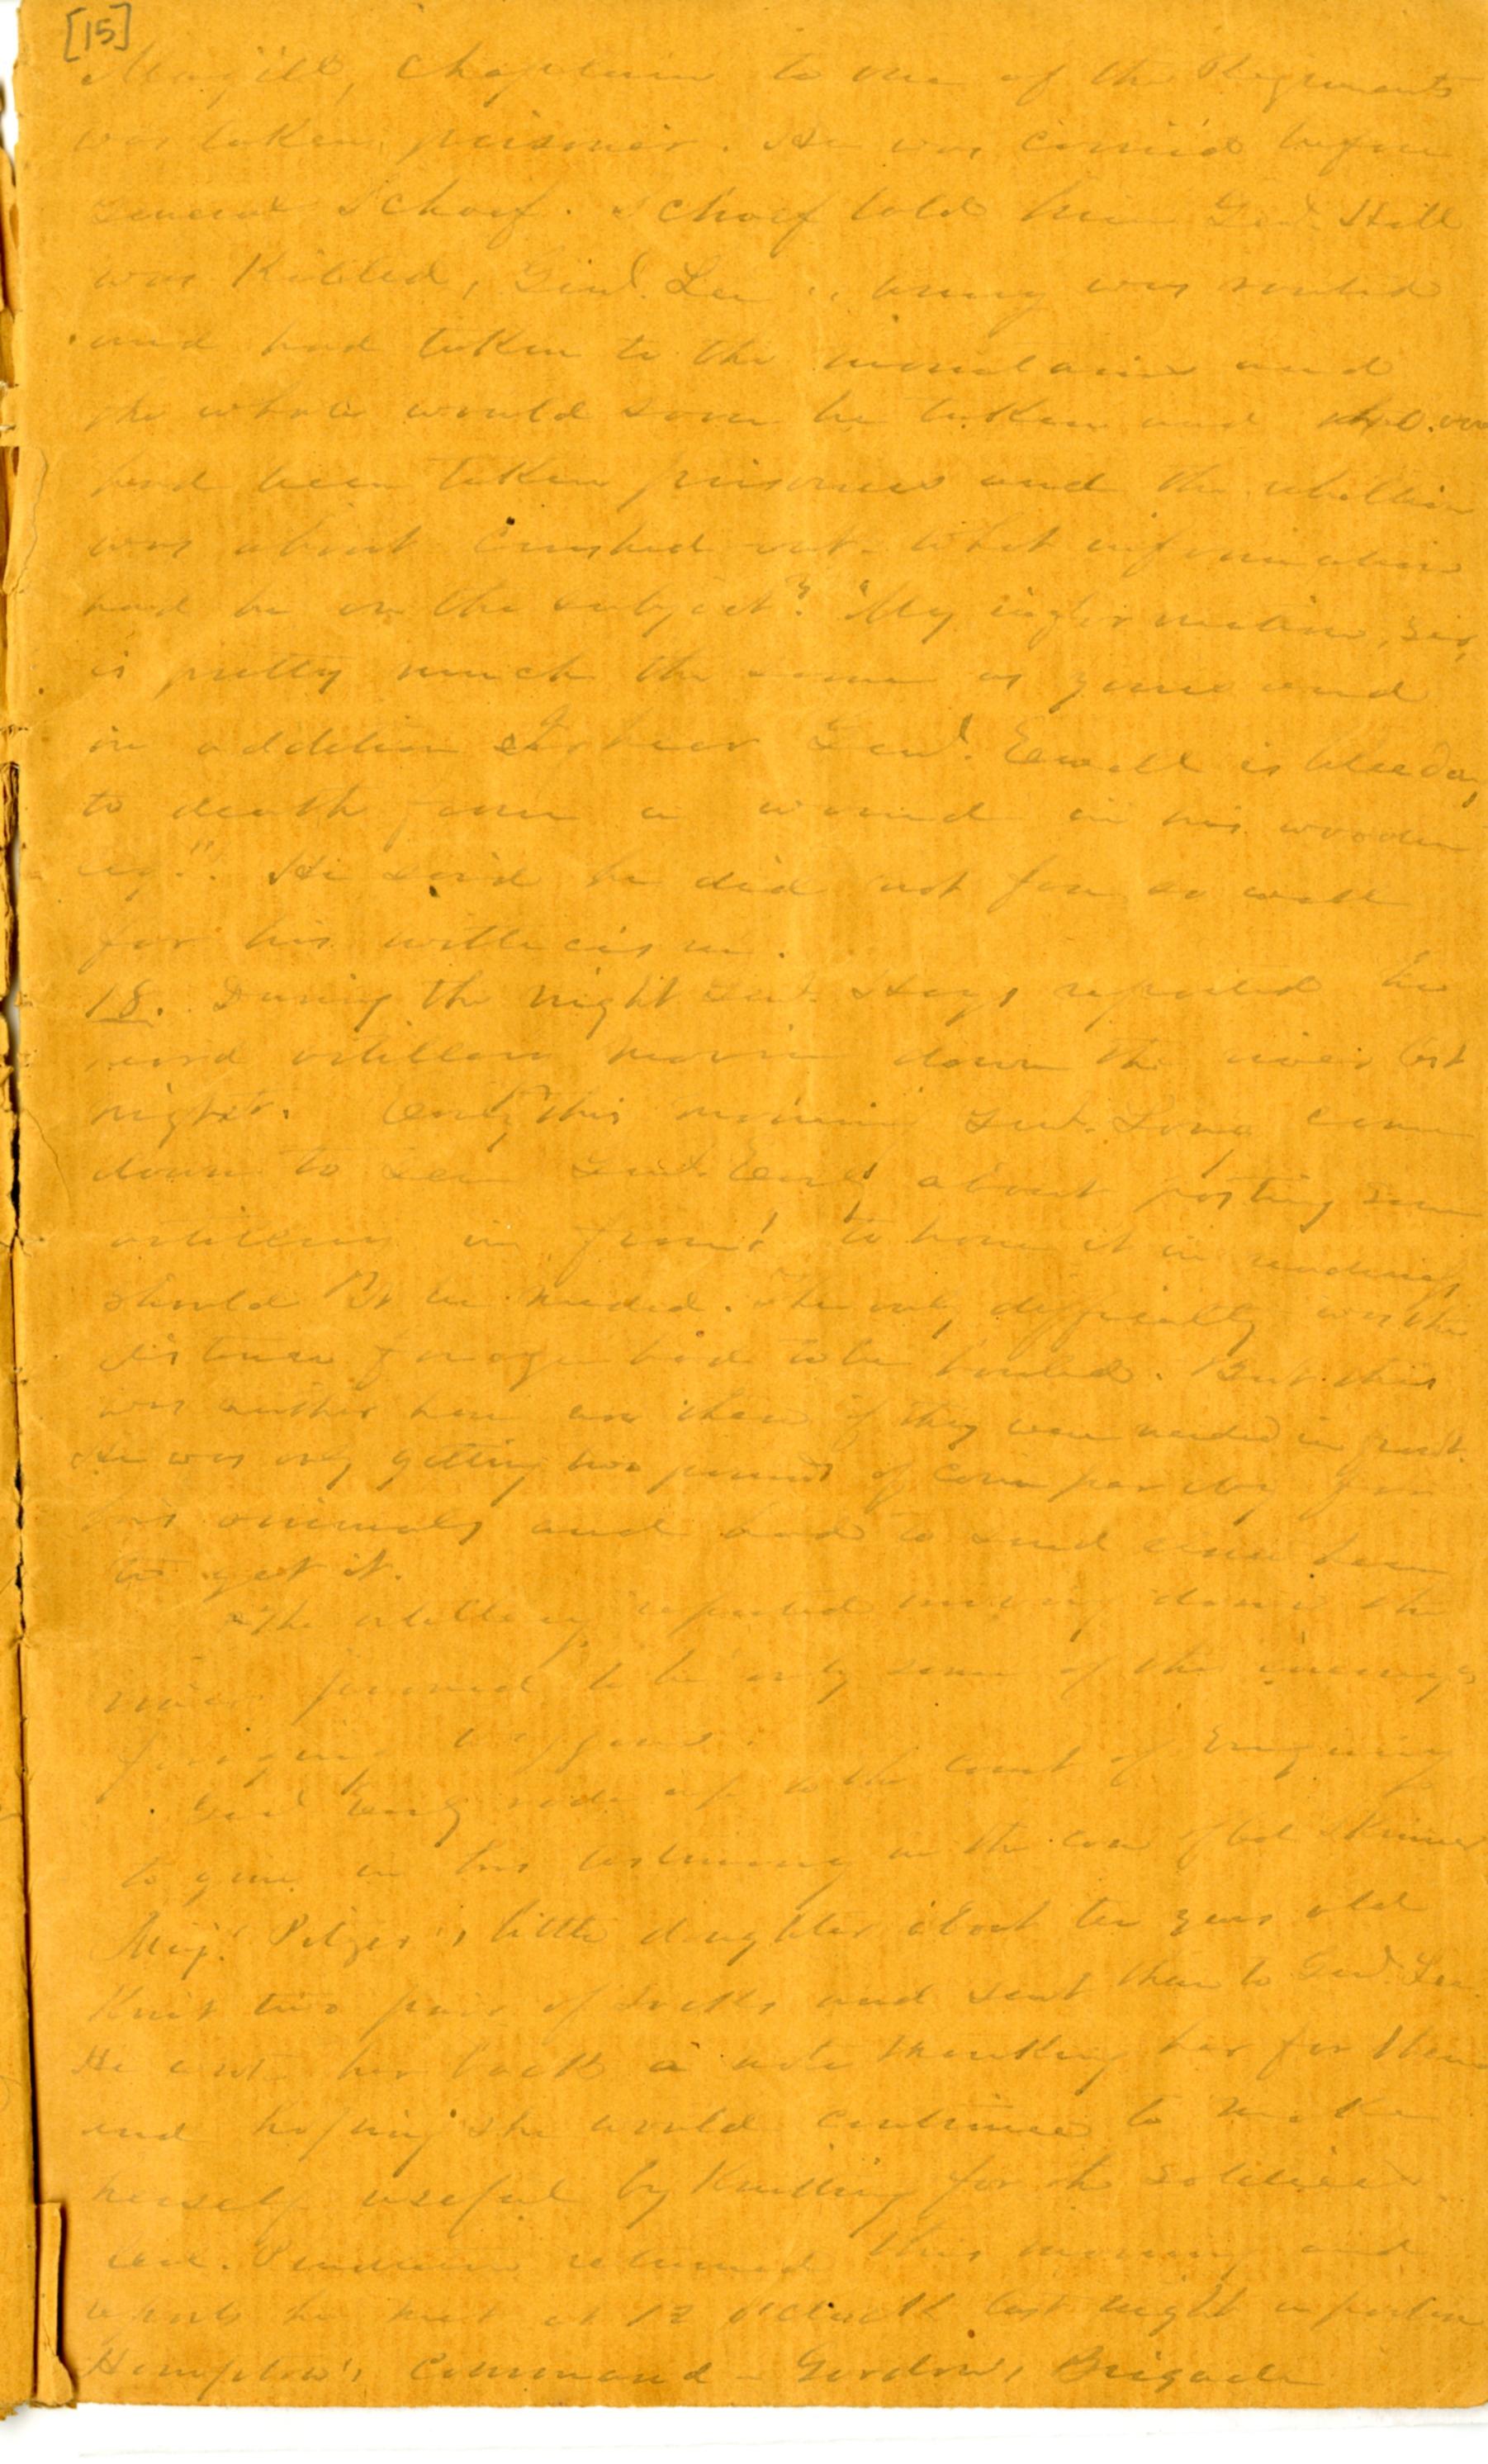 18631118001